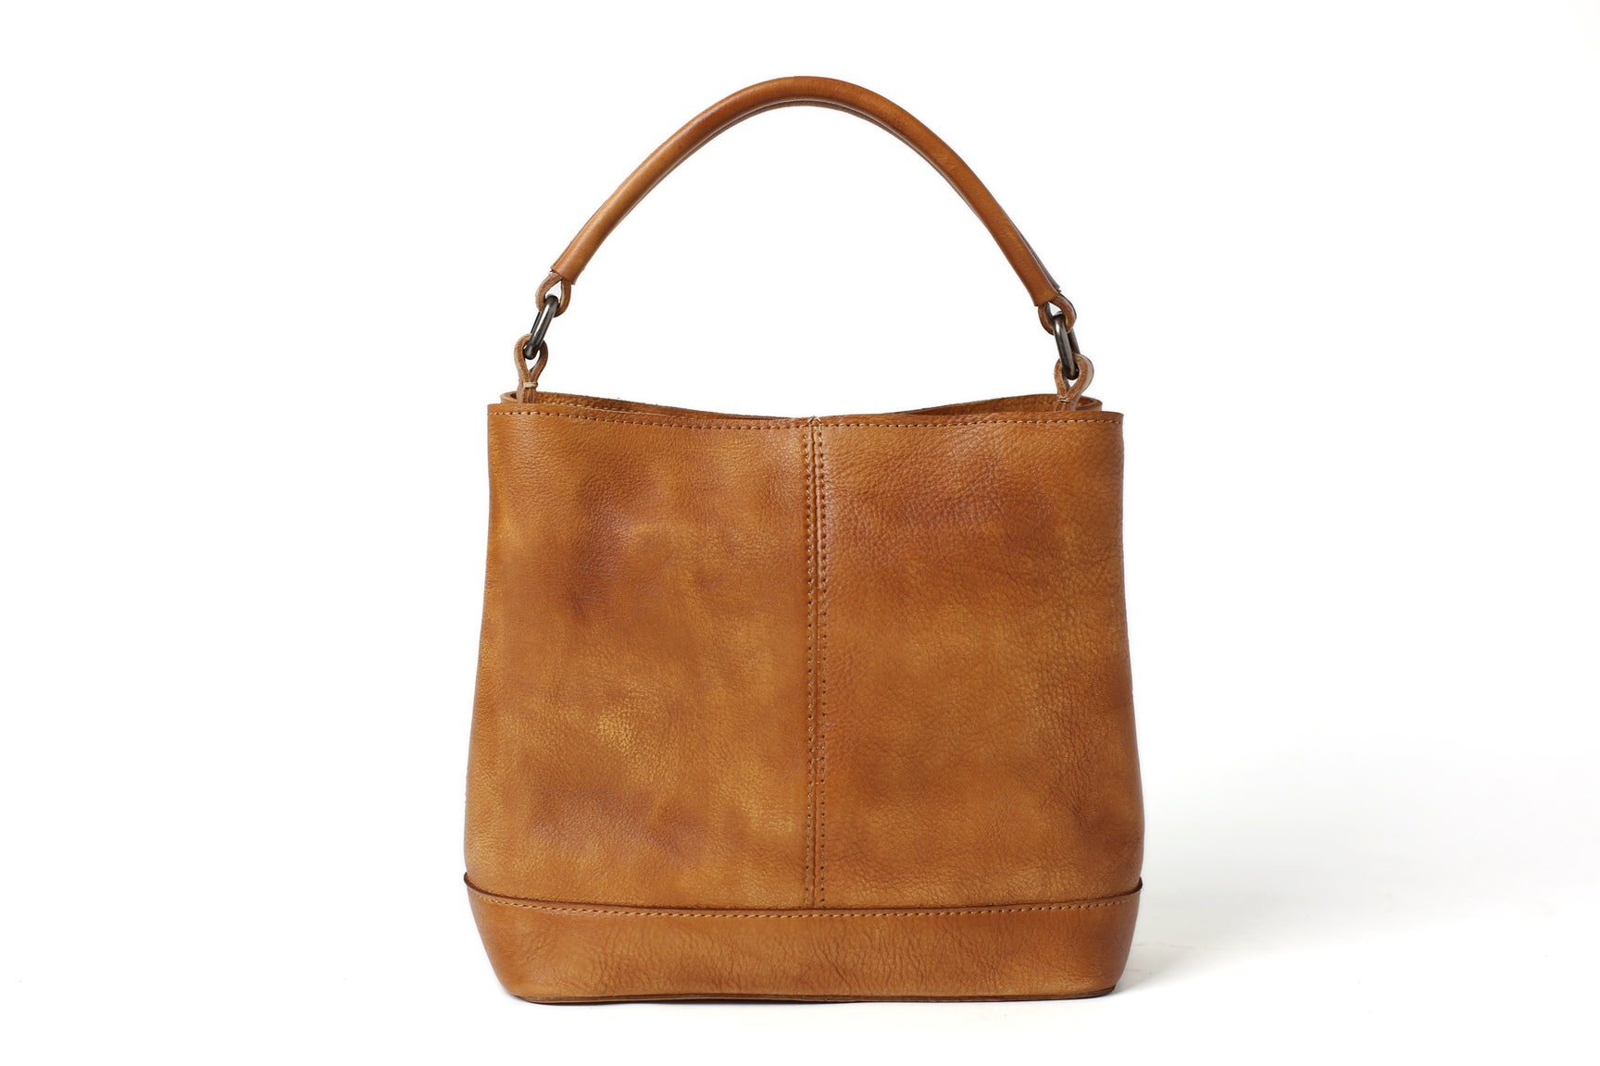 Green Leather Bag Everyday Bag Green Tote Bag Leather Handmade Bag Large Tote Bag